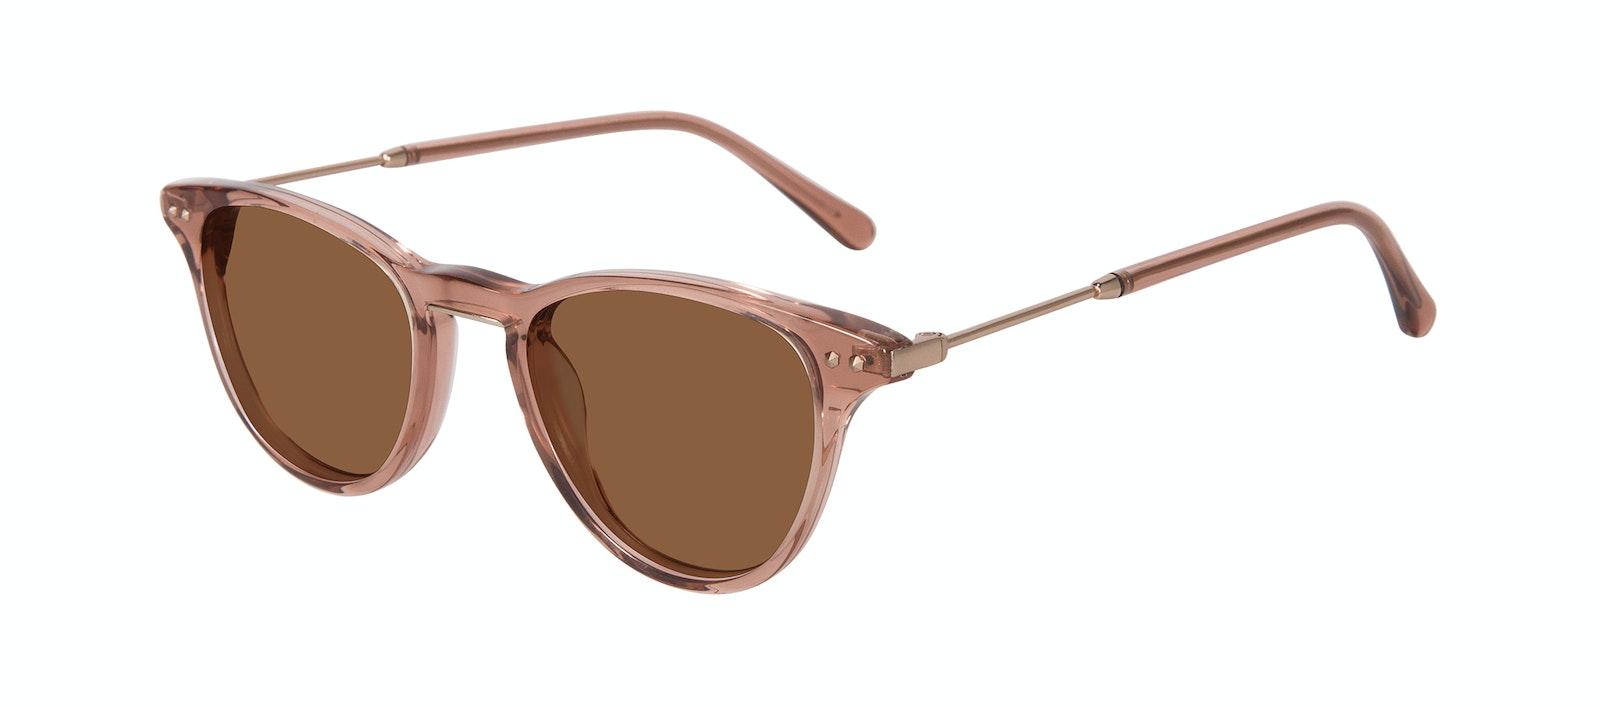 Affordable Fashion Glasses Cat Eye Sunglasses Women Halo Rose Tilt